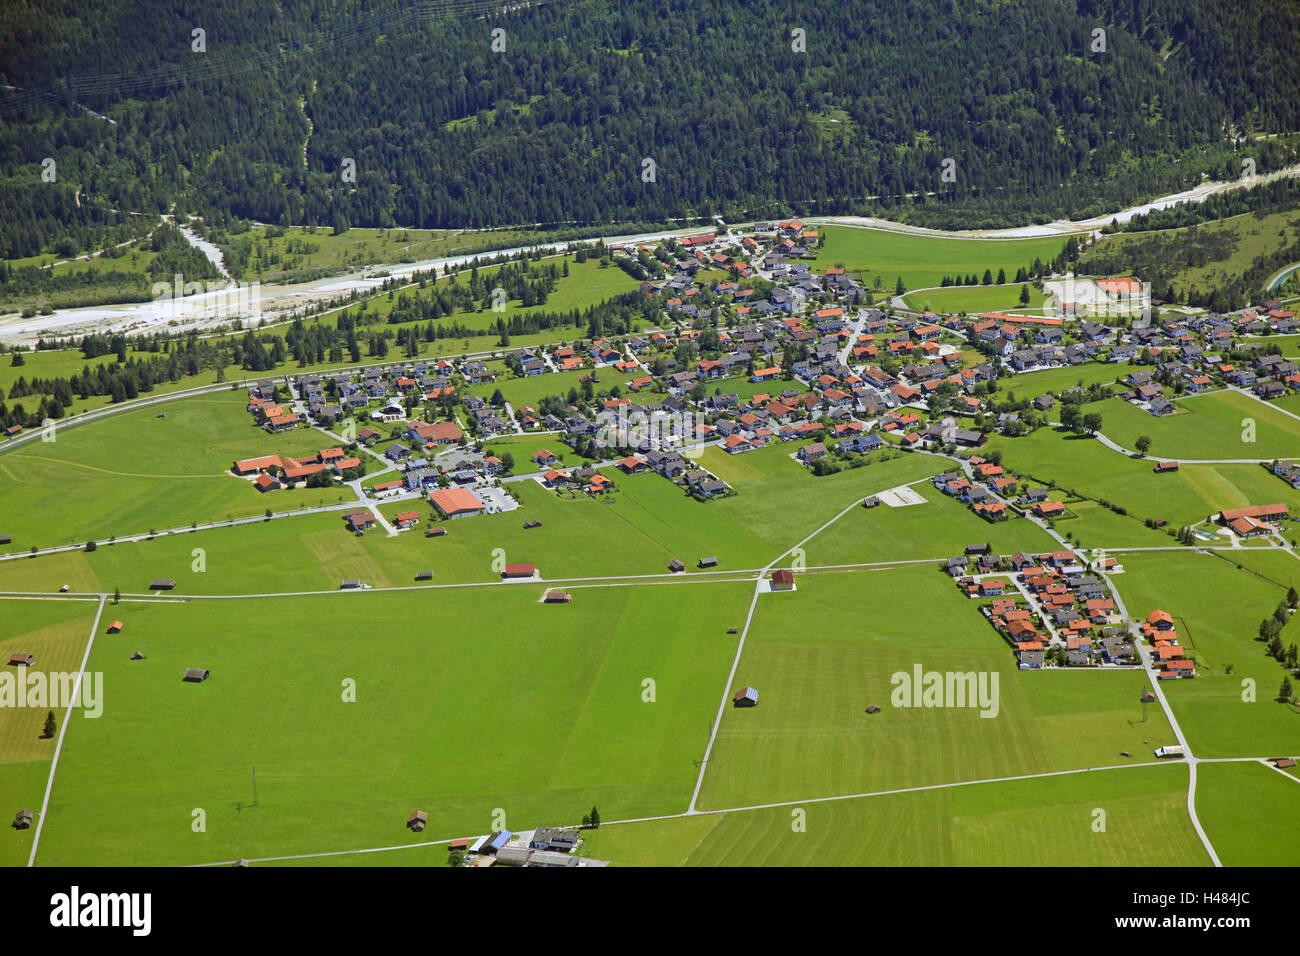 Germany, Upper Bavaria, Krün, aerial shots, Isar valley, Bavaria, in Bavarian, groups trees, ways, agrarian - Stock Image